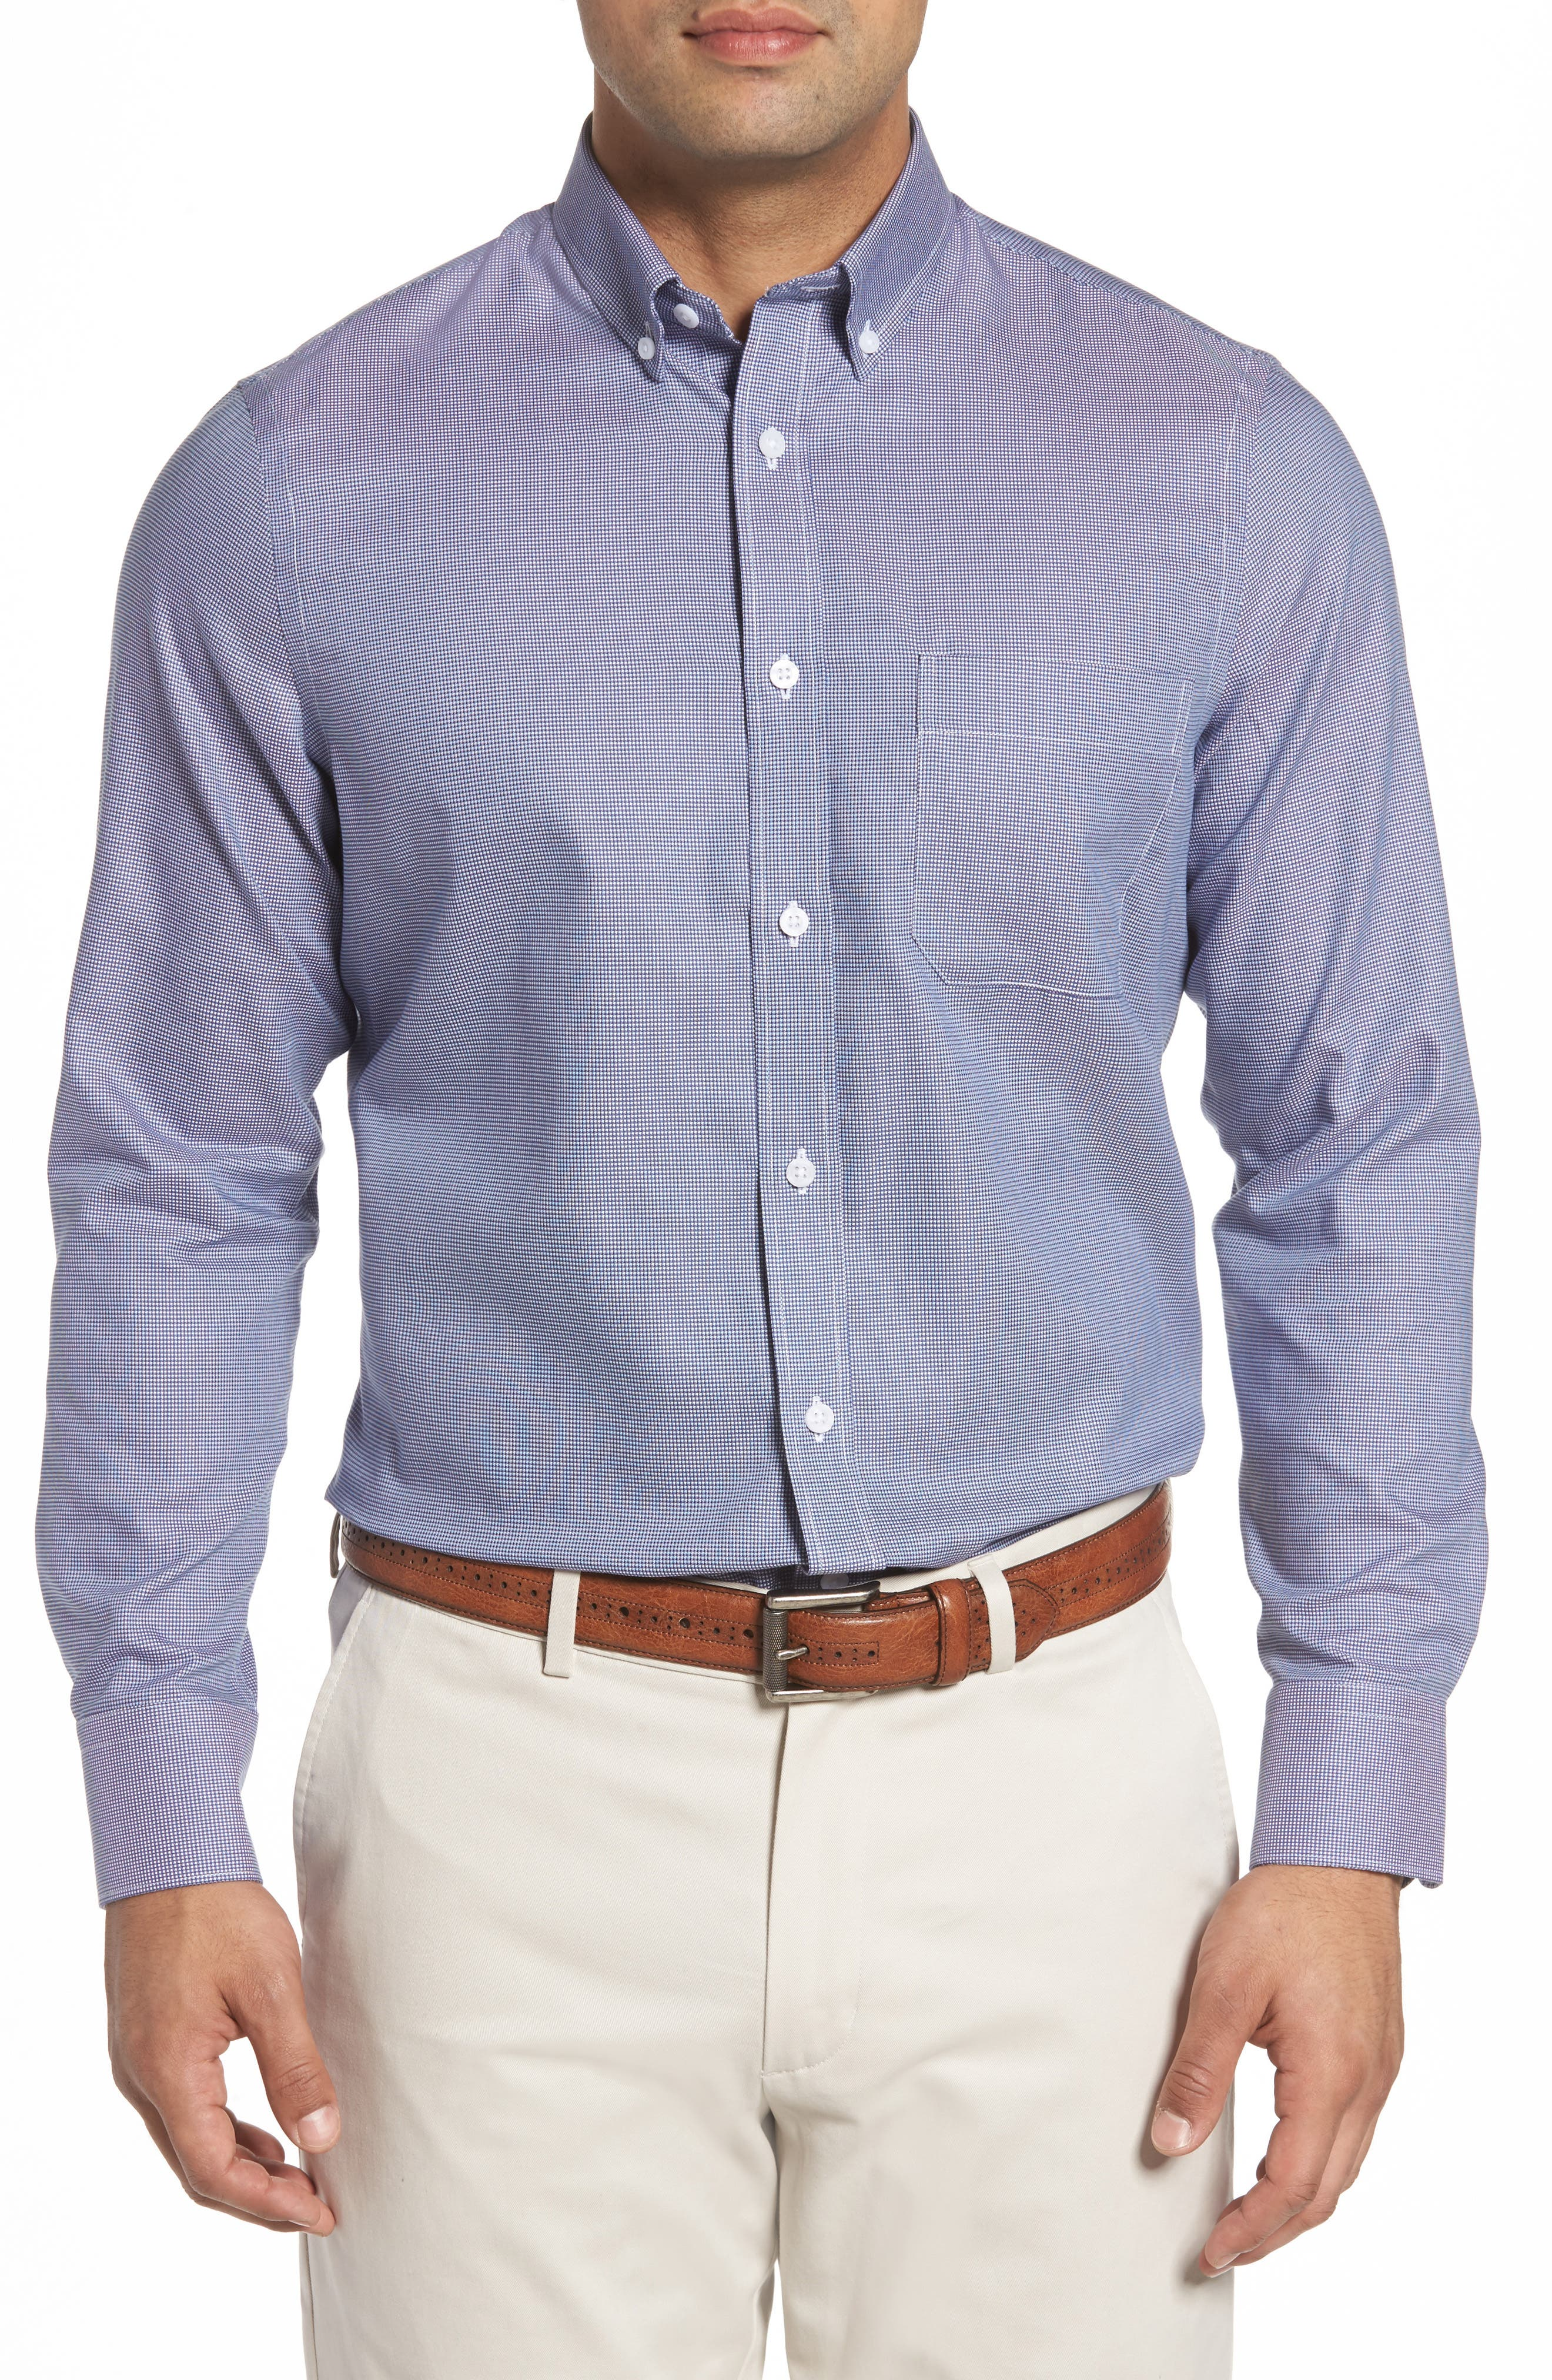 Nordstrom Men's Shop Regular Fit Stretch Sport Shirt (Big & Tall)